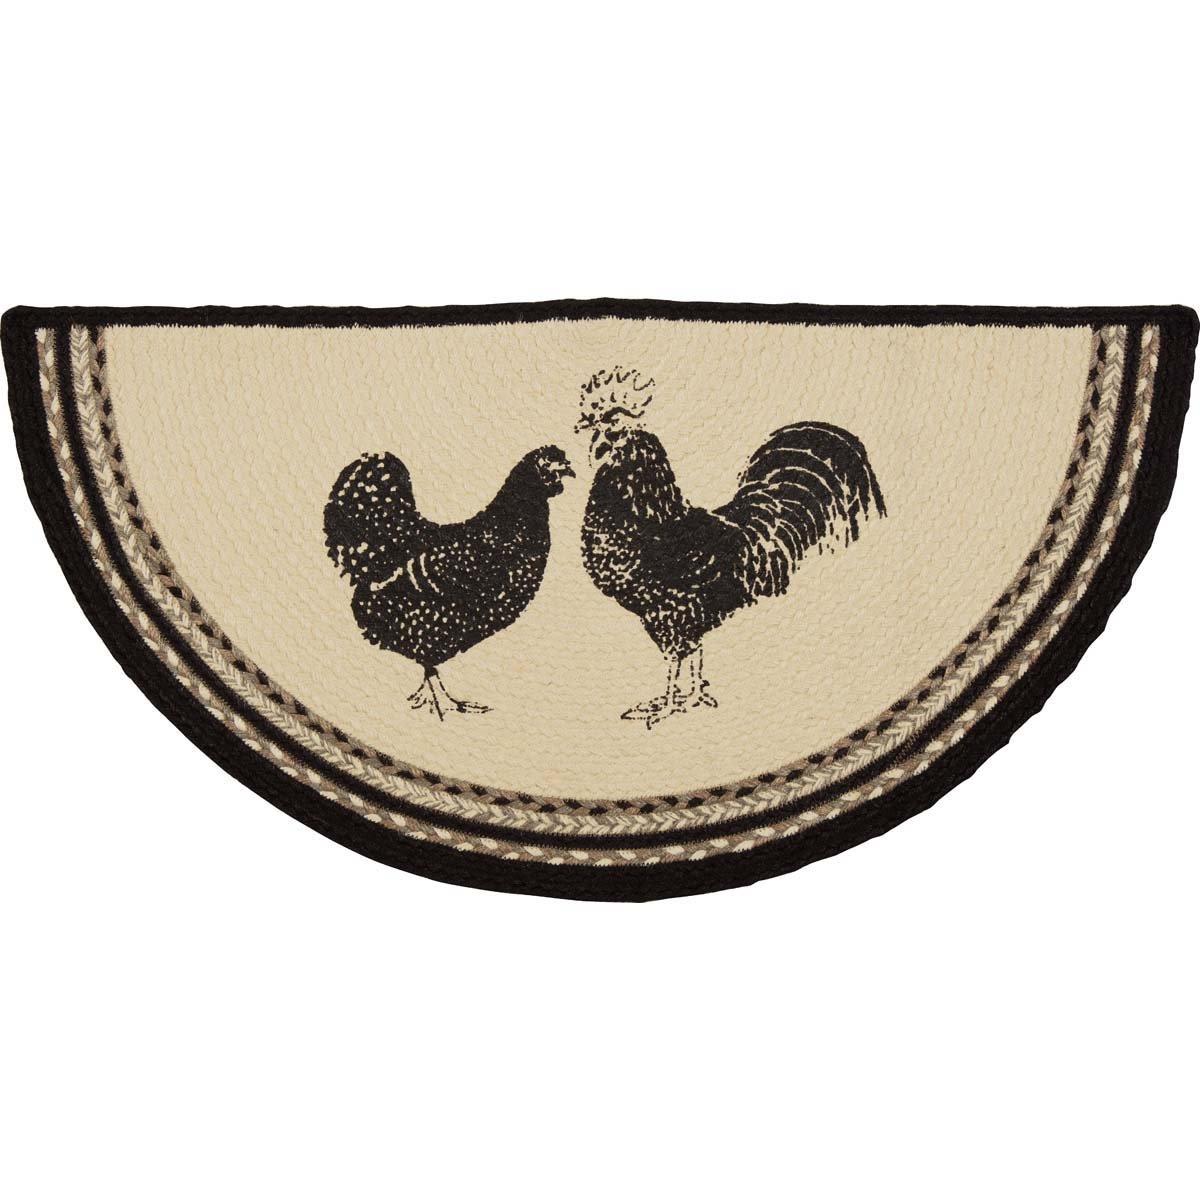 Sawyer Mill Poultry Jute Rug Half Circle (16.5x33)